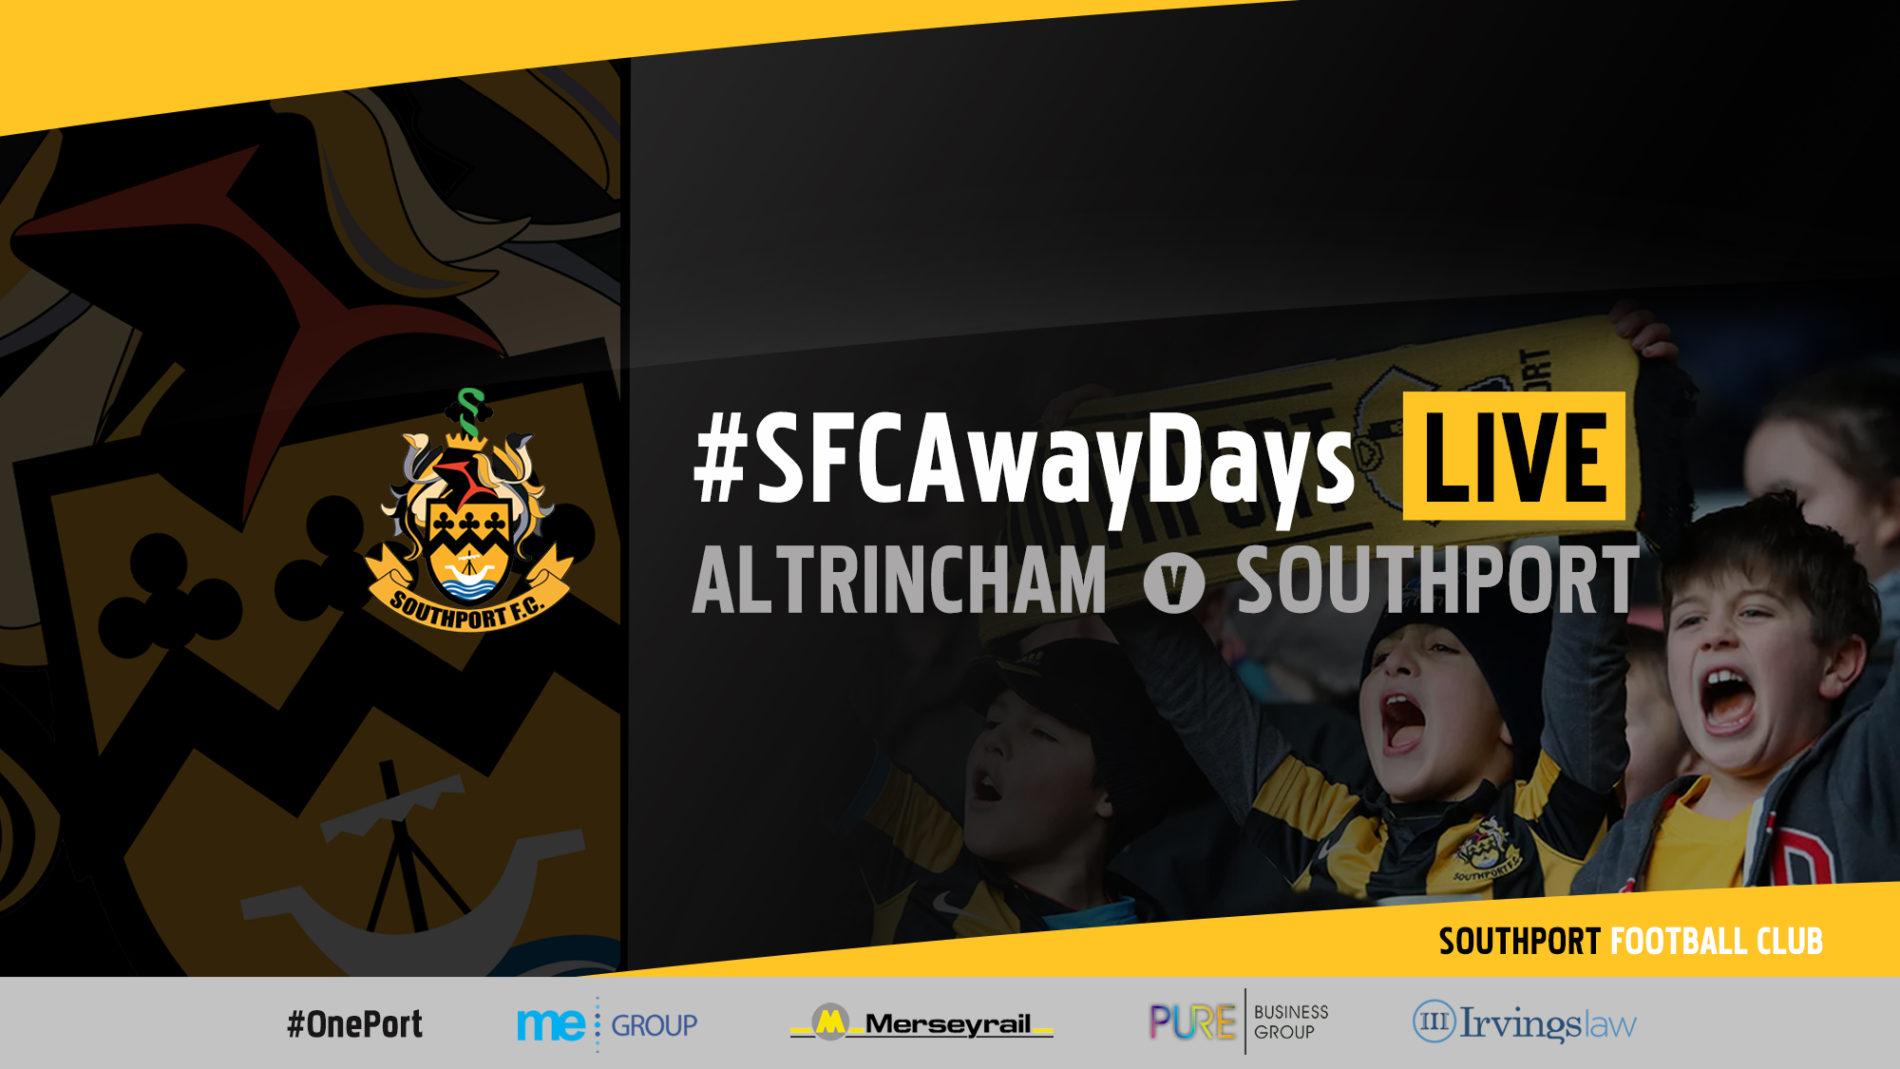 #SFCAwayDays LIVE | Altrincham v Southport